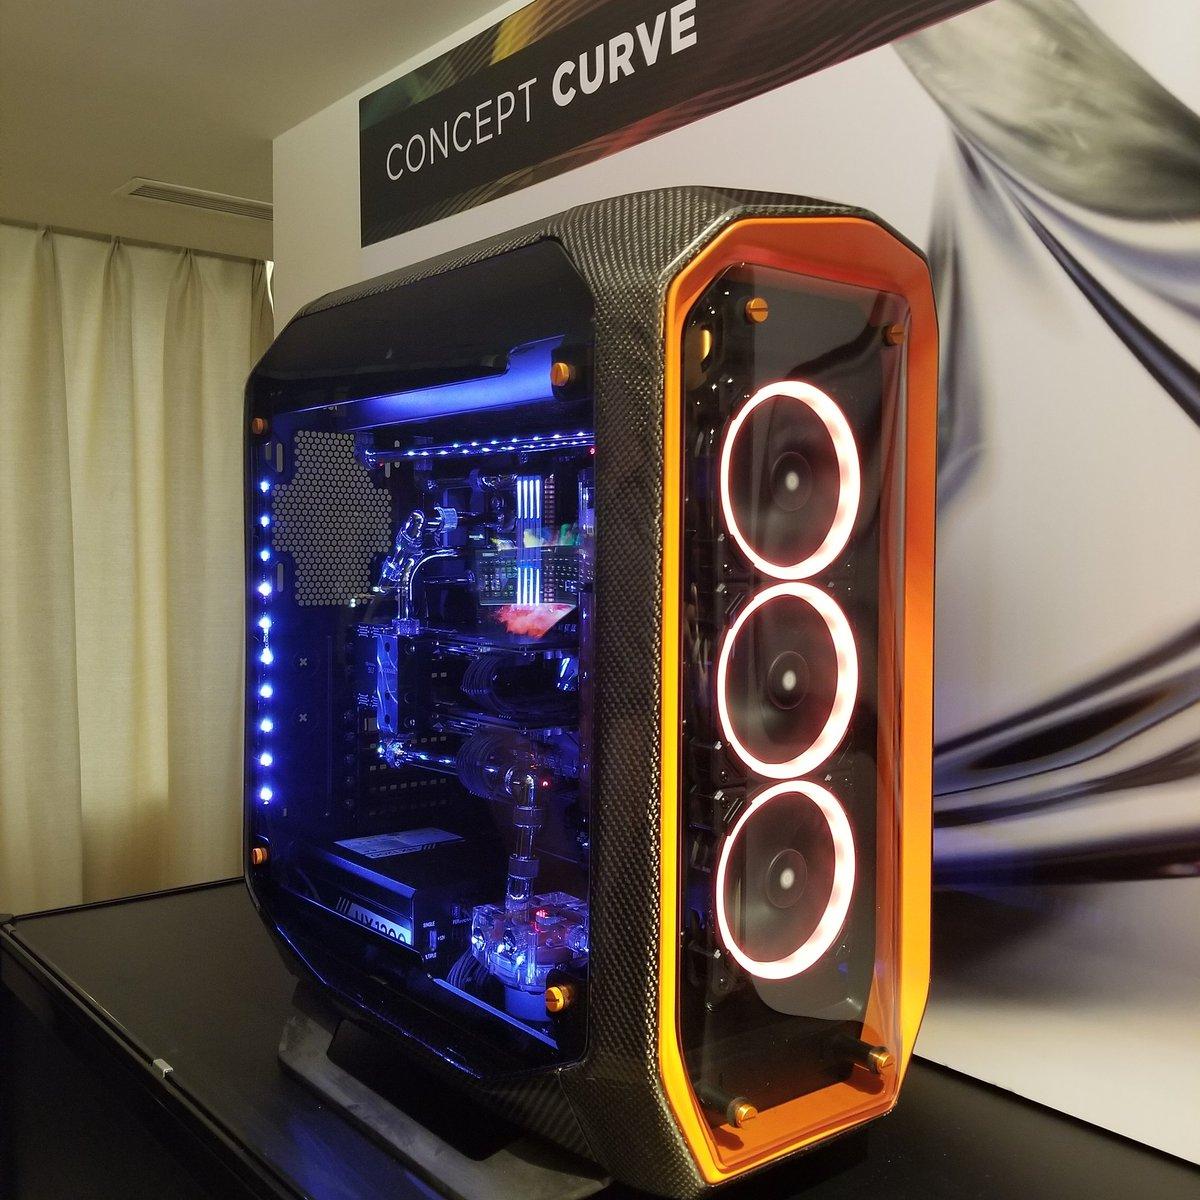 Indestructible Corsair PC Case at Computex : Corridor